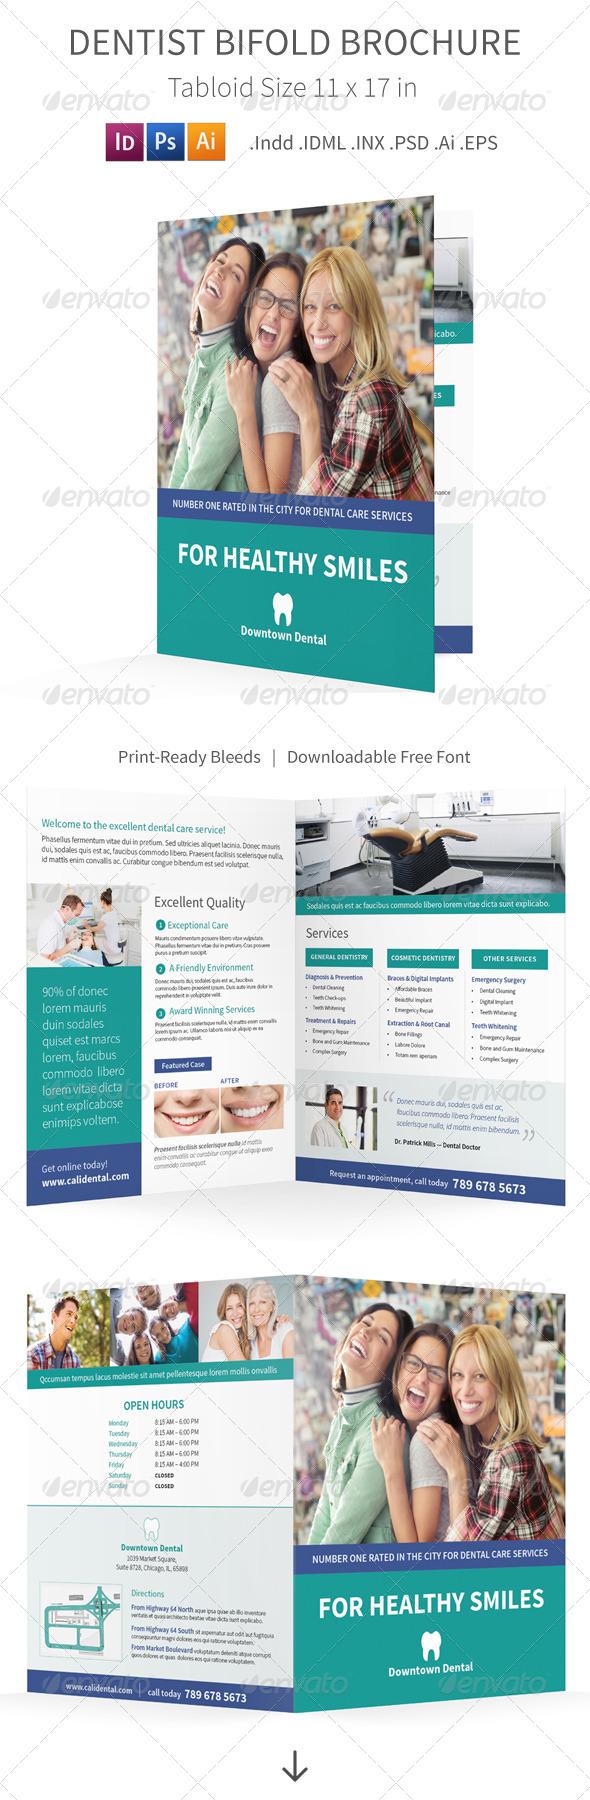 GraphicRiver Dentist Bifold Halffold Brochure 8069036